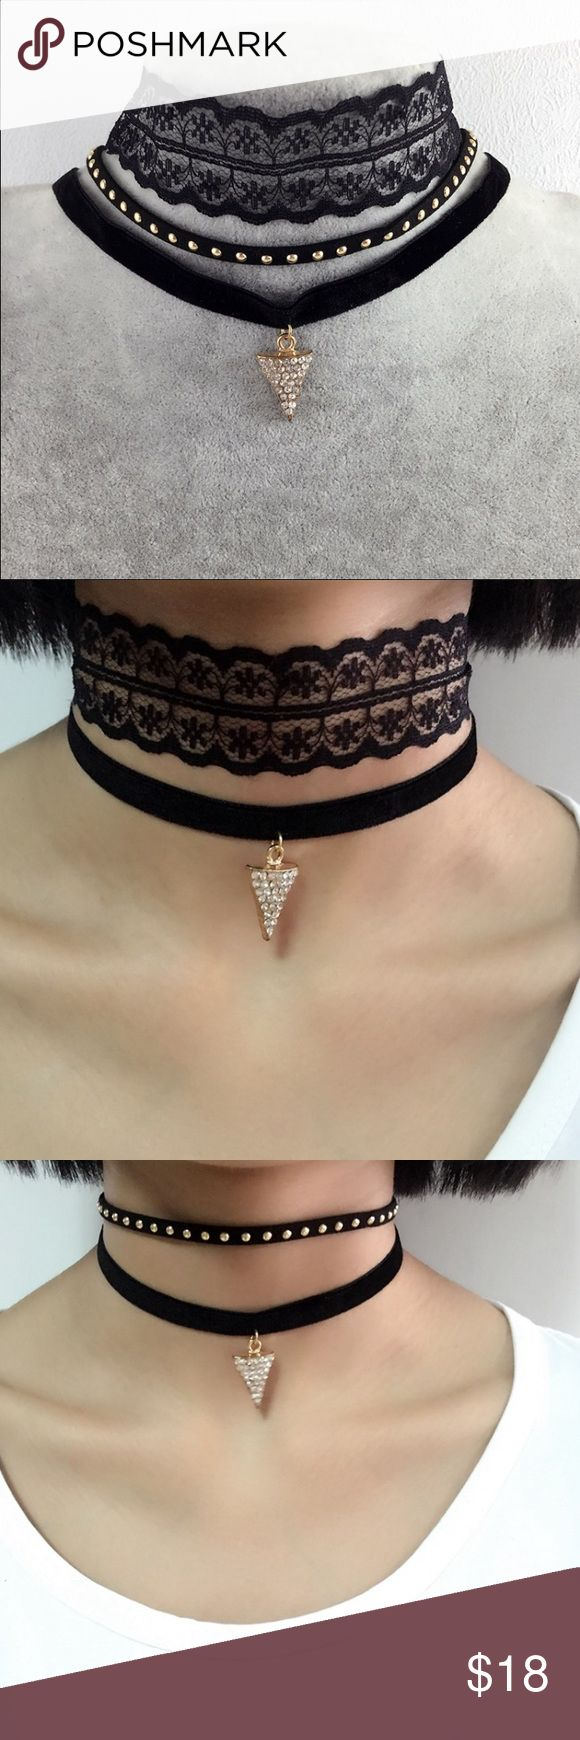 LOWERED*** 3/pcs Triangle Set Choker New Fashion Black Velvet Choker With Triangle Pendant Jewelry Necklaces